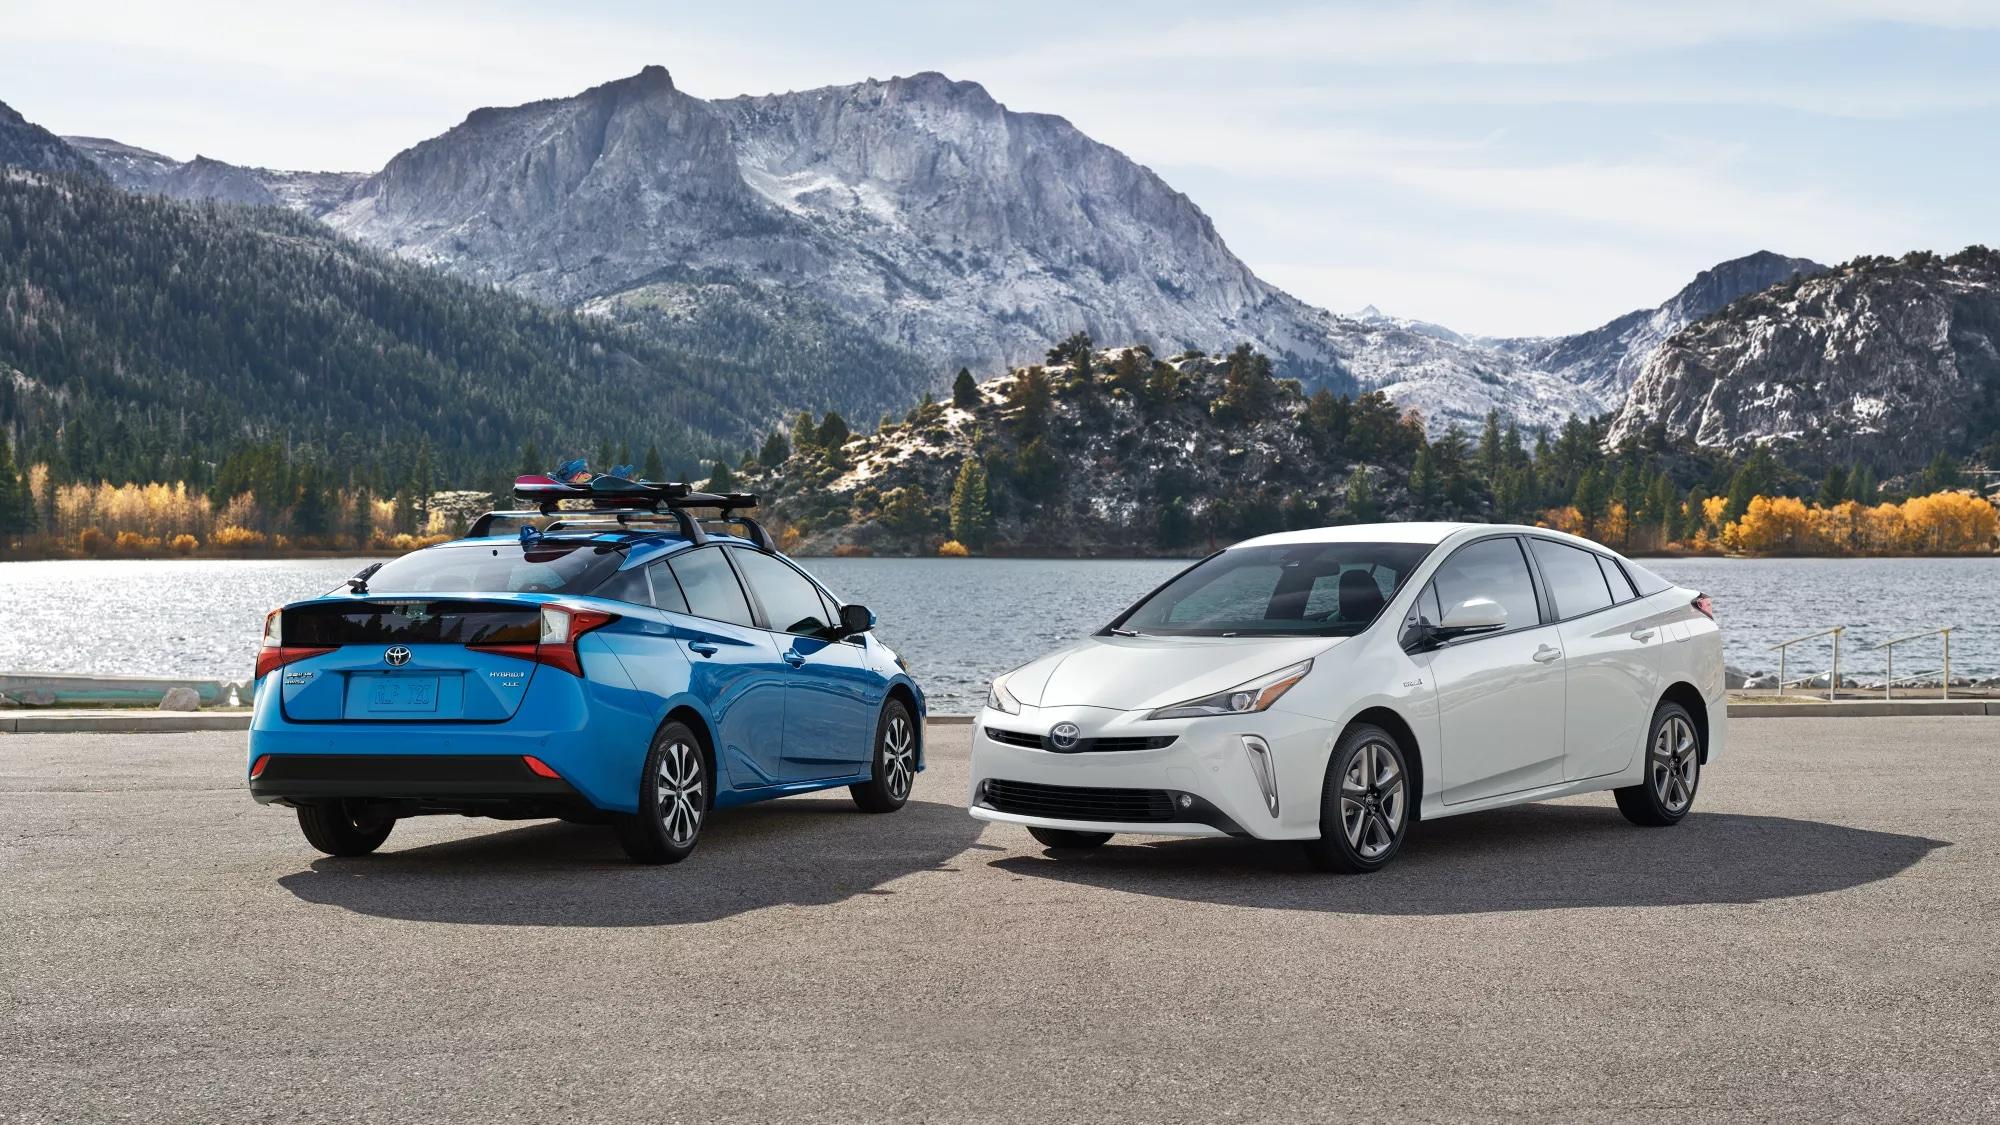 New Hybrid Vehicles at Bryan College Station Toyota Near Me - Bryan, TX